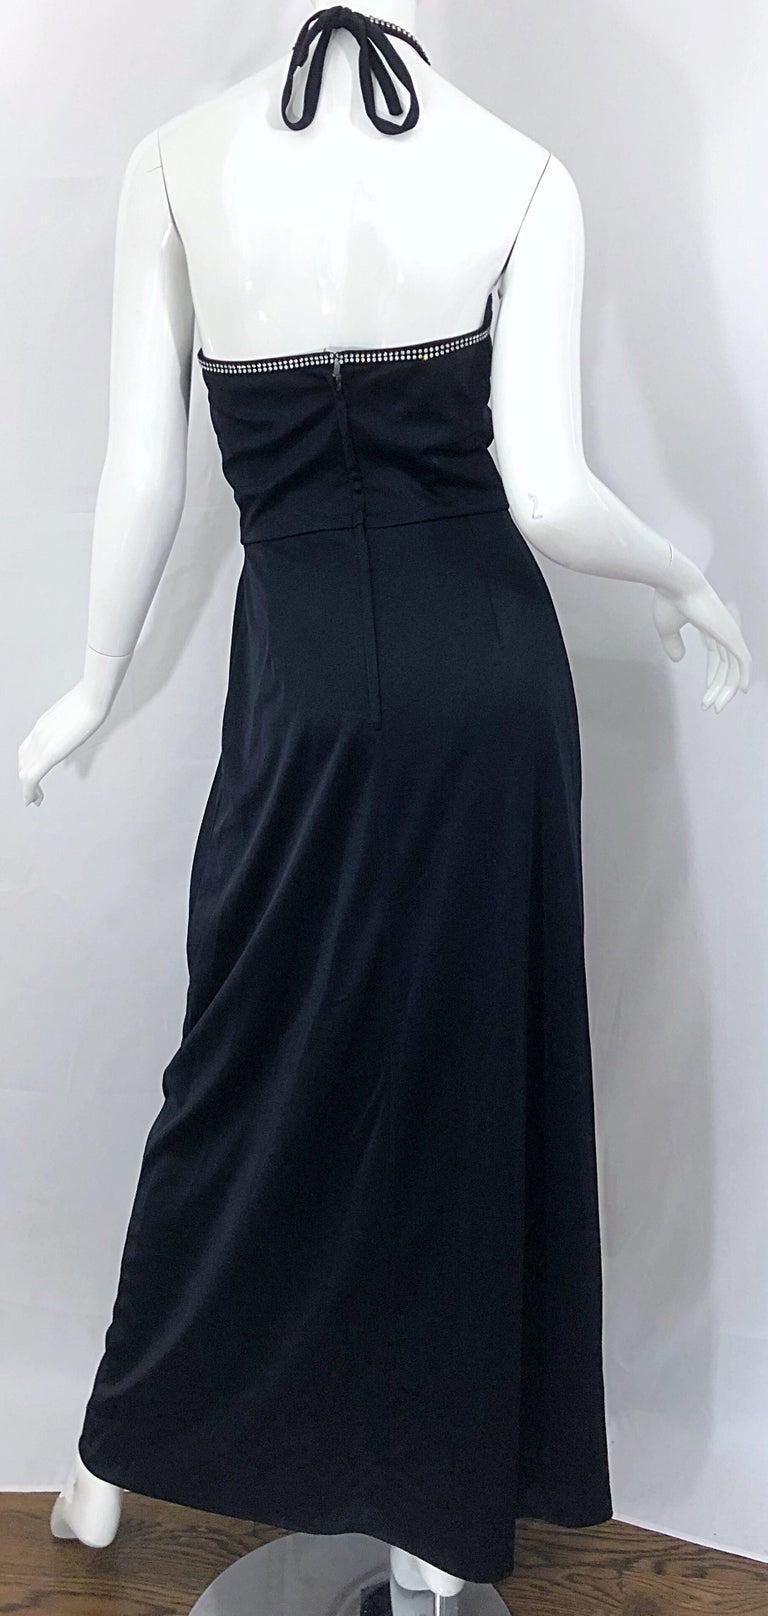 1970s Lilli Diamond Black Jersey Rhinestone Vintage 70s Wrap Maxi Dress Gown For Sale 8